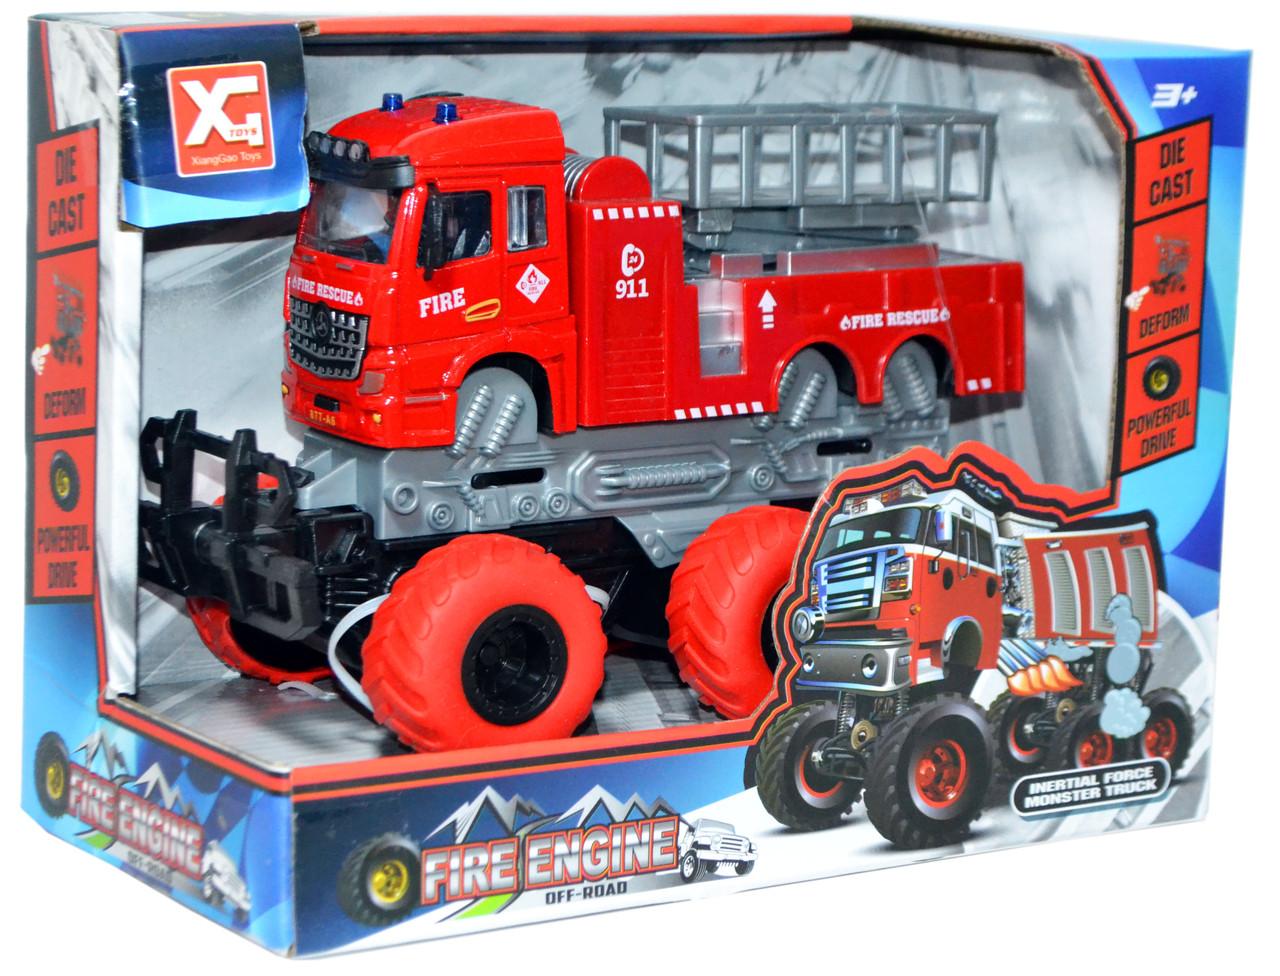 XG878-A61ABC Монстер-Пожарный 6 колес,3вида  Truck OFFROAD, 24*18см